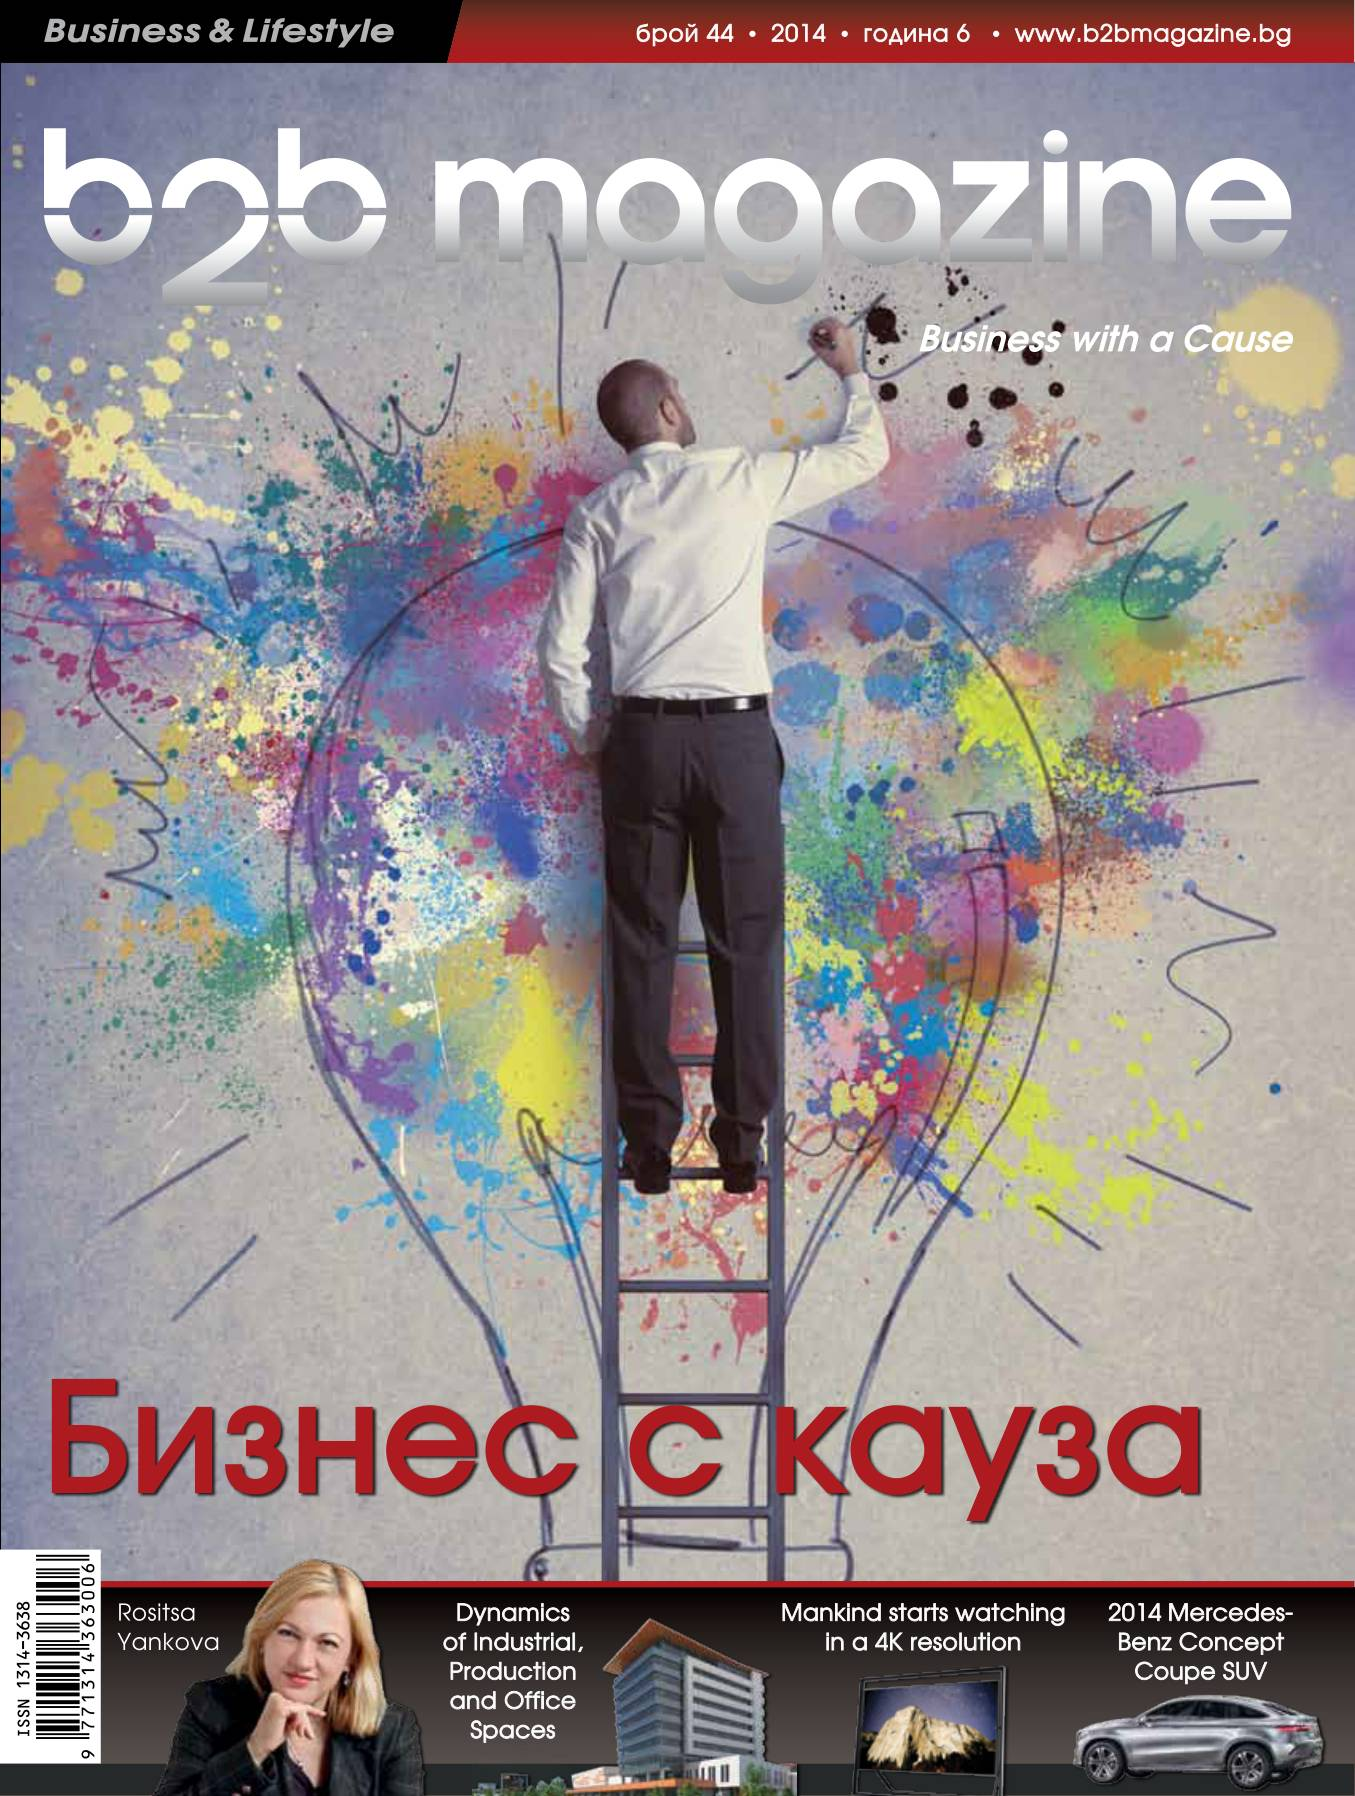 44_B2BMagazine_web.pdf_1